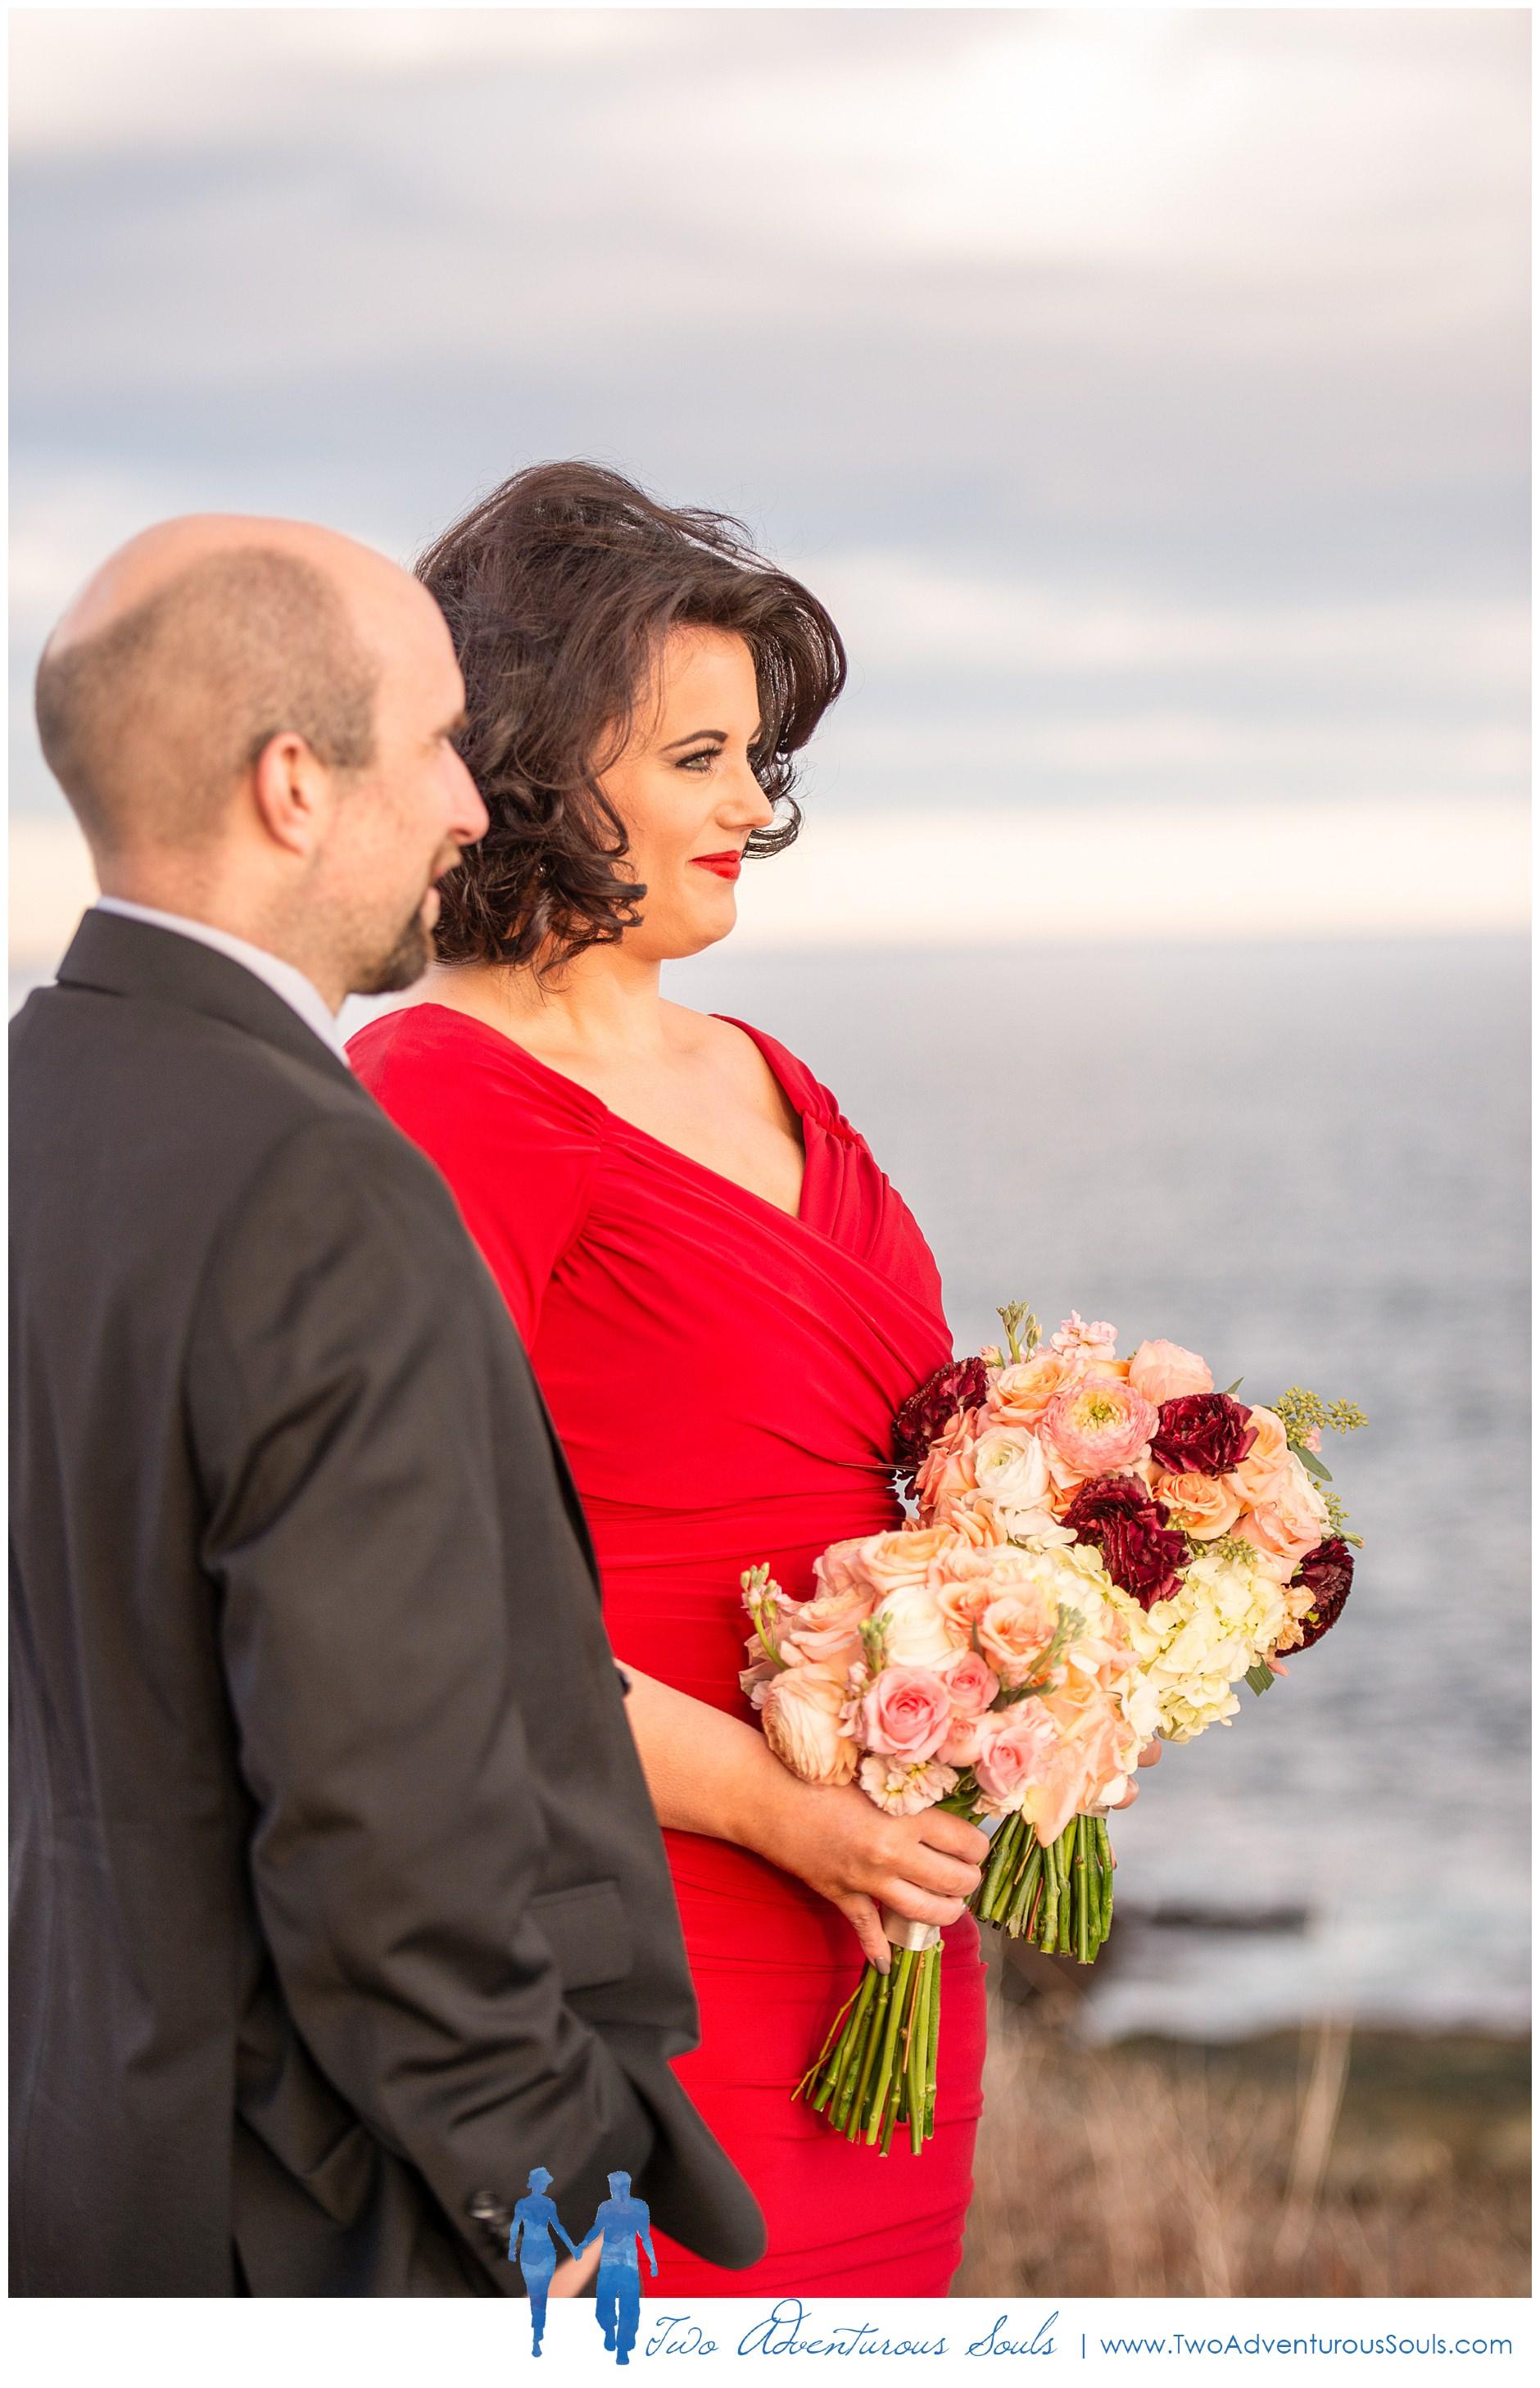 Inn by The Sea Elopement, Maine Elopement Photographer, Maine Wedding Photographers, Two Adventurous Souls_040619_0019.jpg